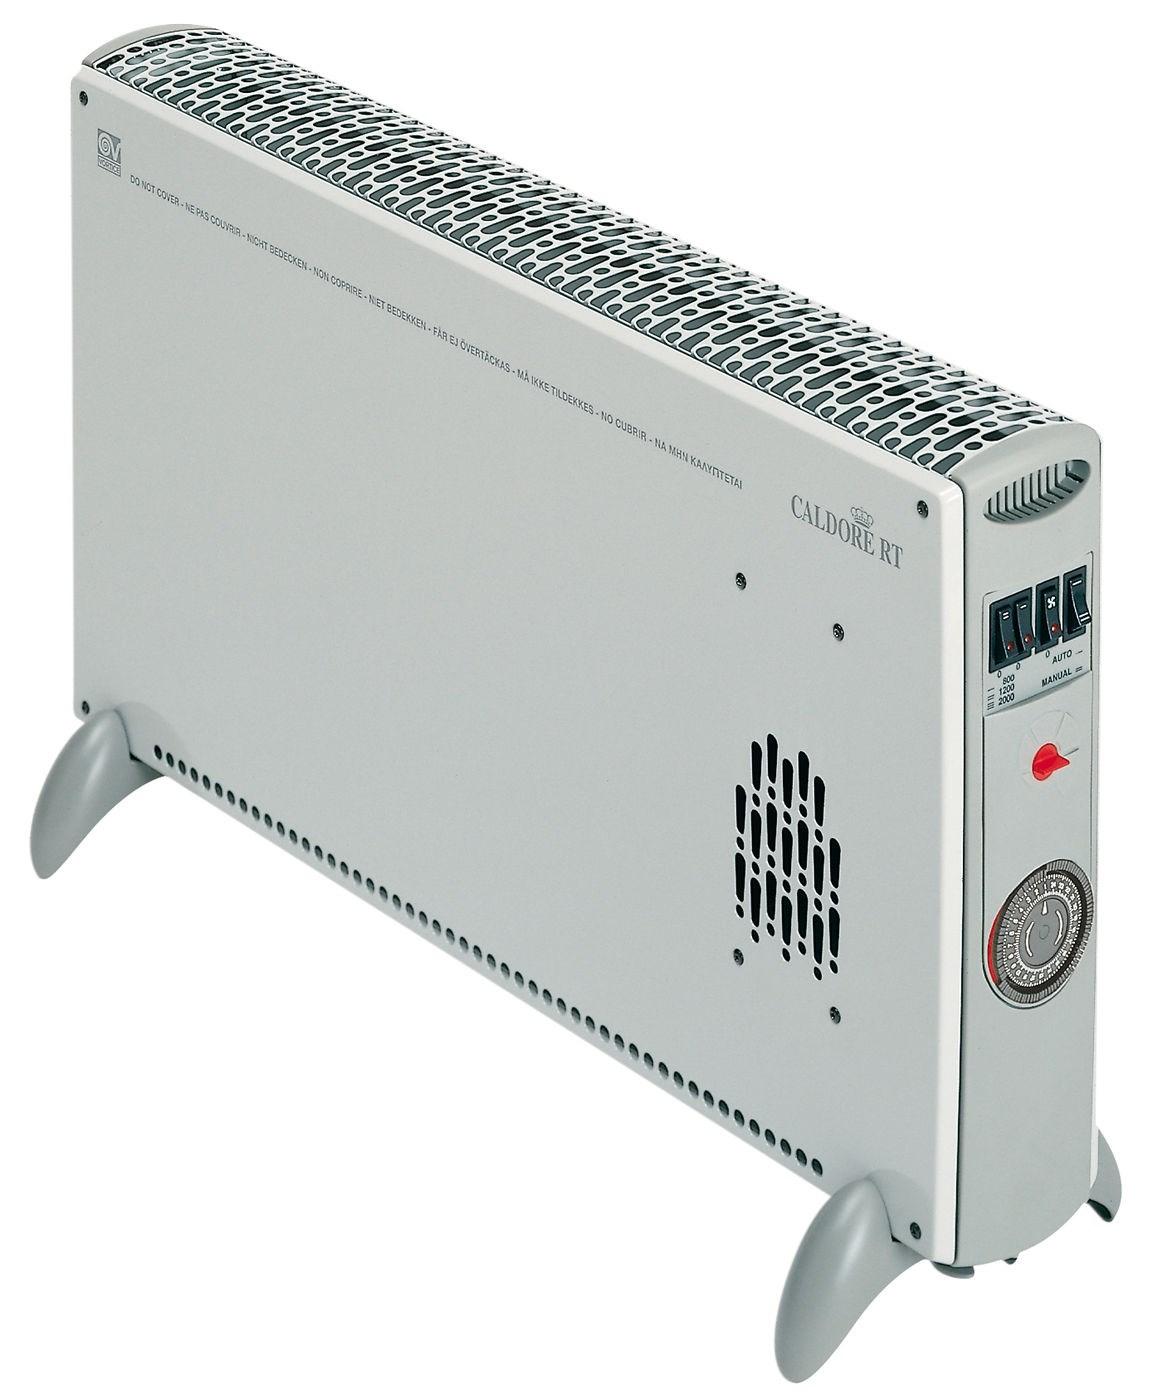 radiateur lectrique caldore axelair ventilation. Black Bedroom Furniture Sets. Home Design Ideas